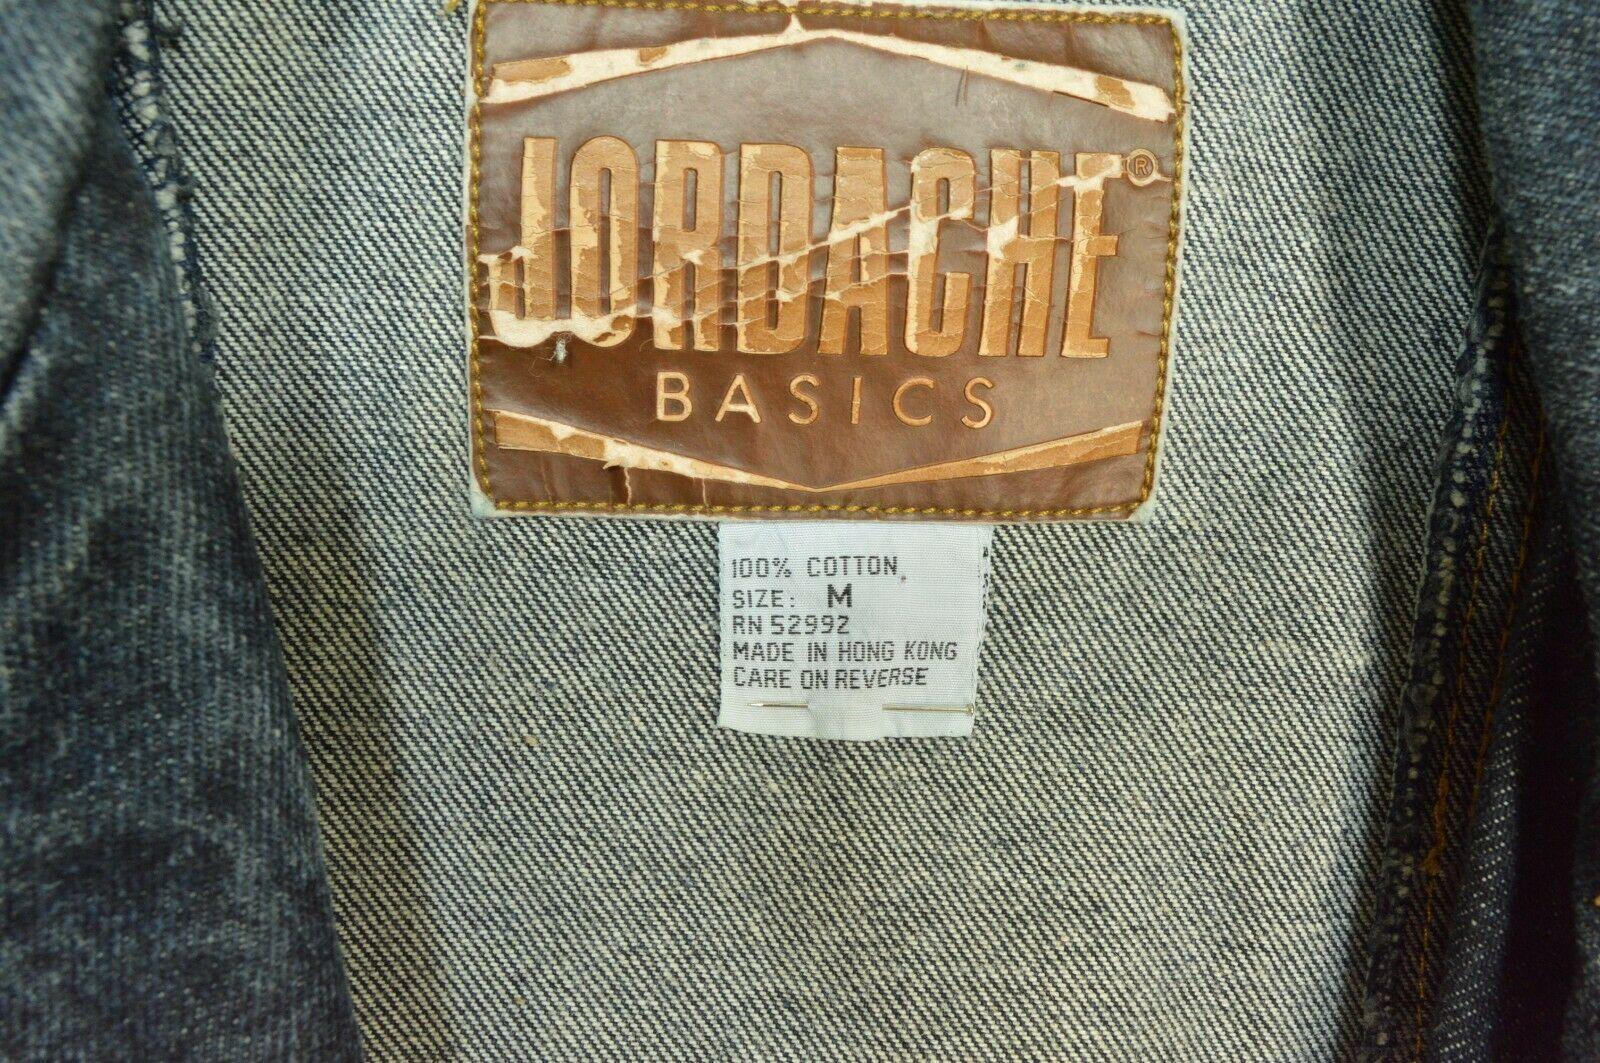 Jordache jeans jacket SZ M denim moto style vintage zippers pockets belt dark image 6